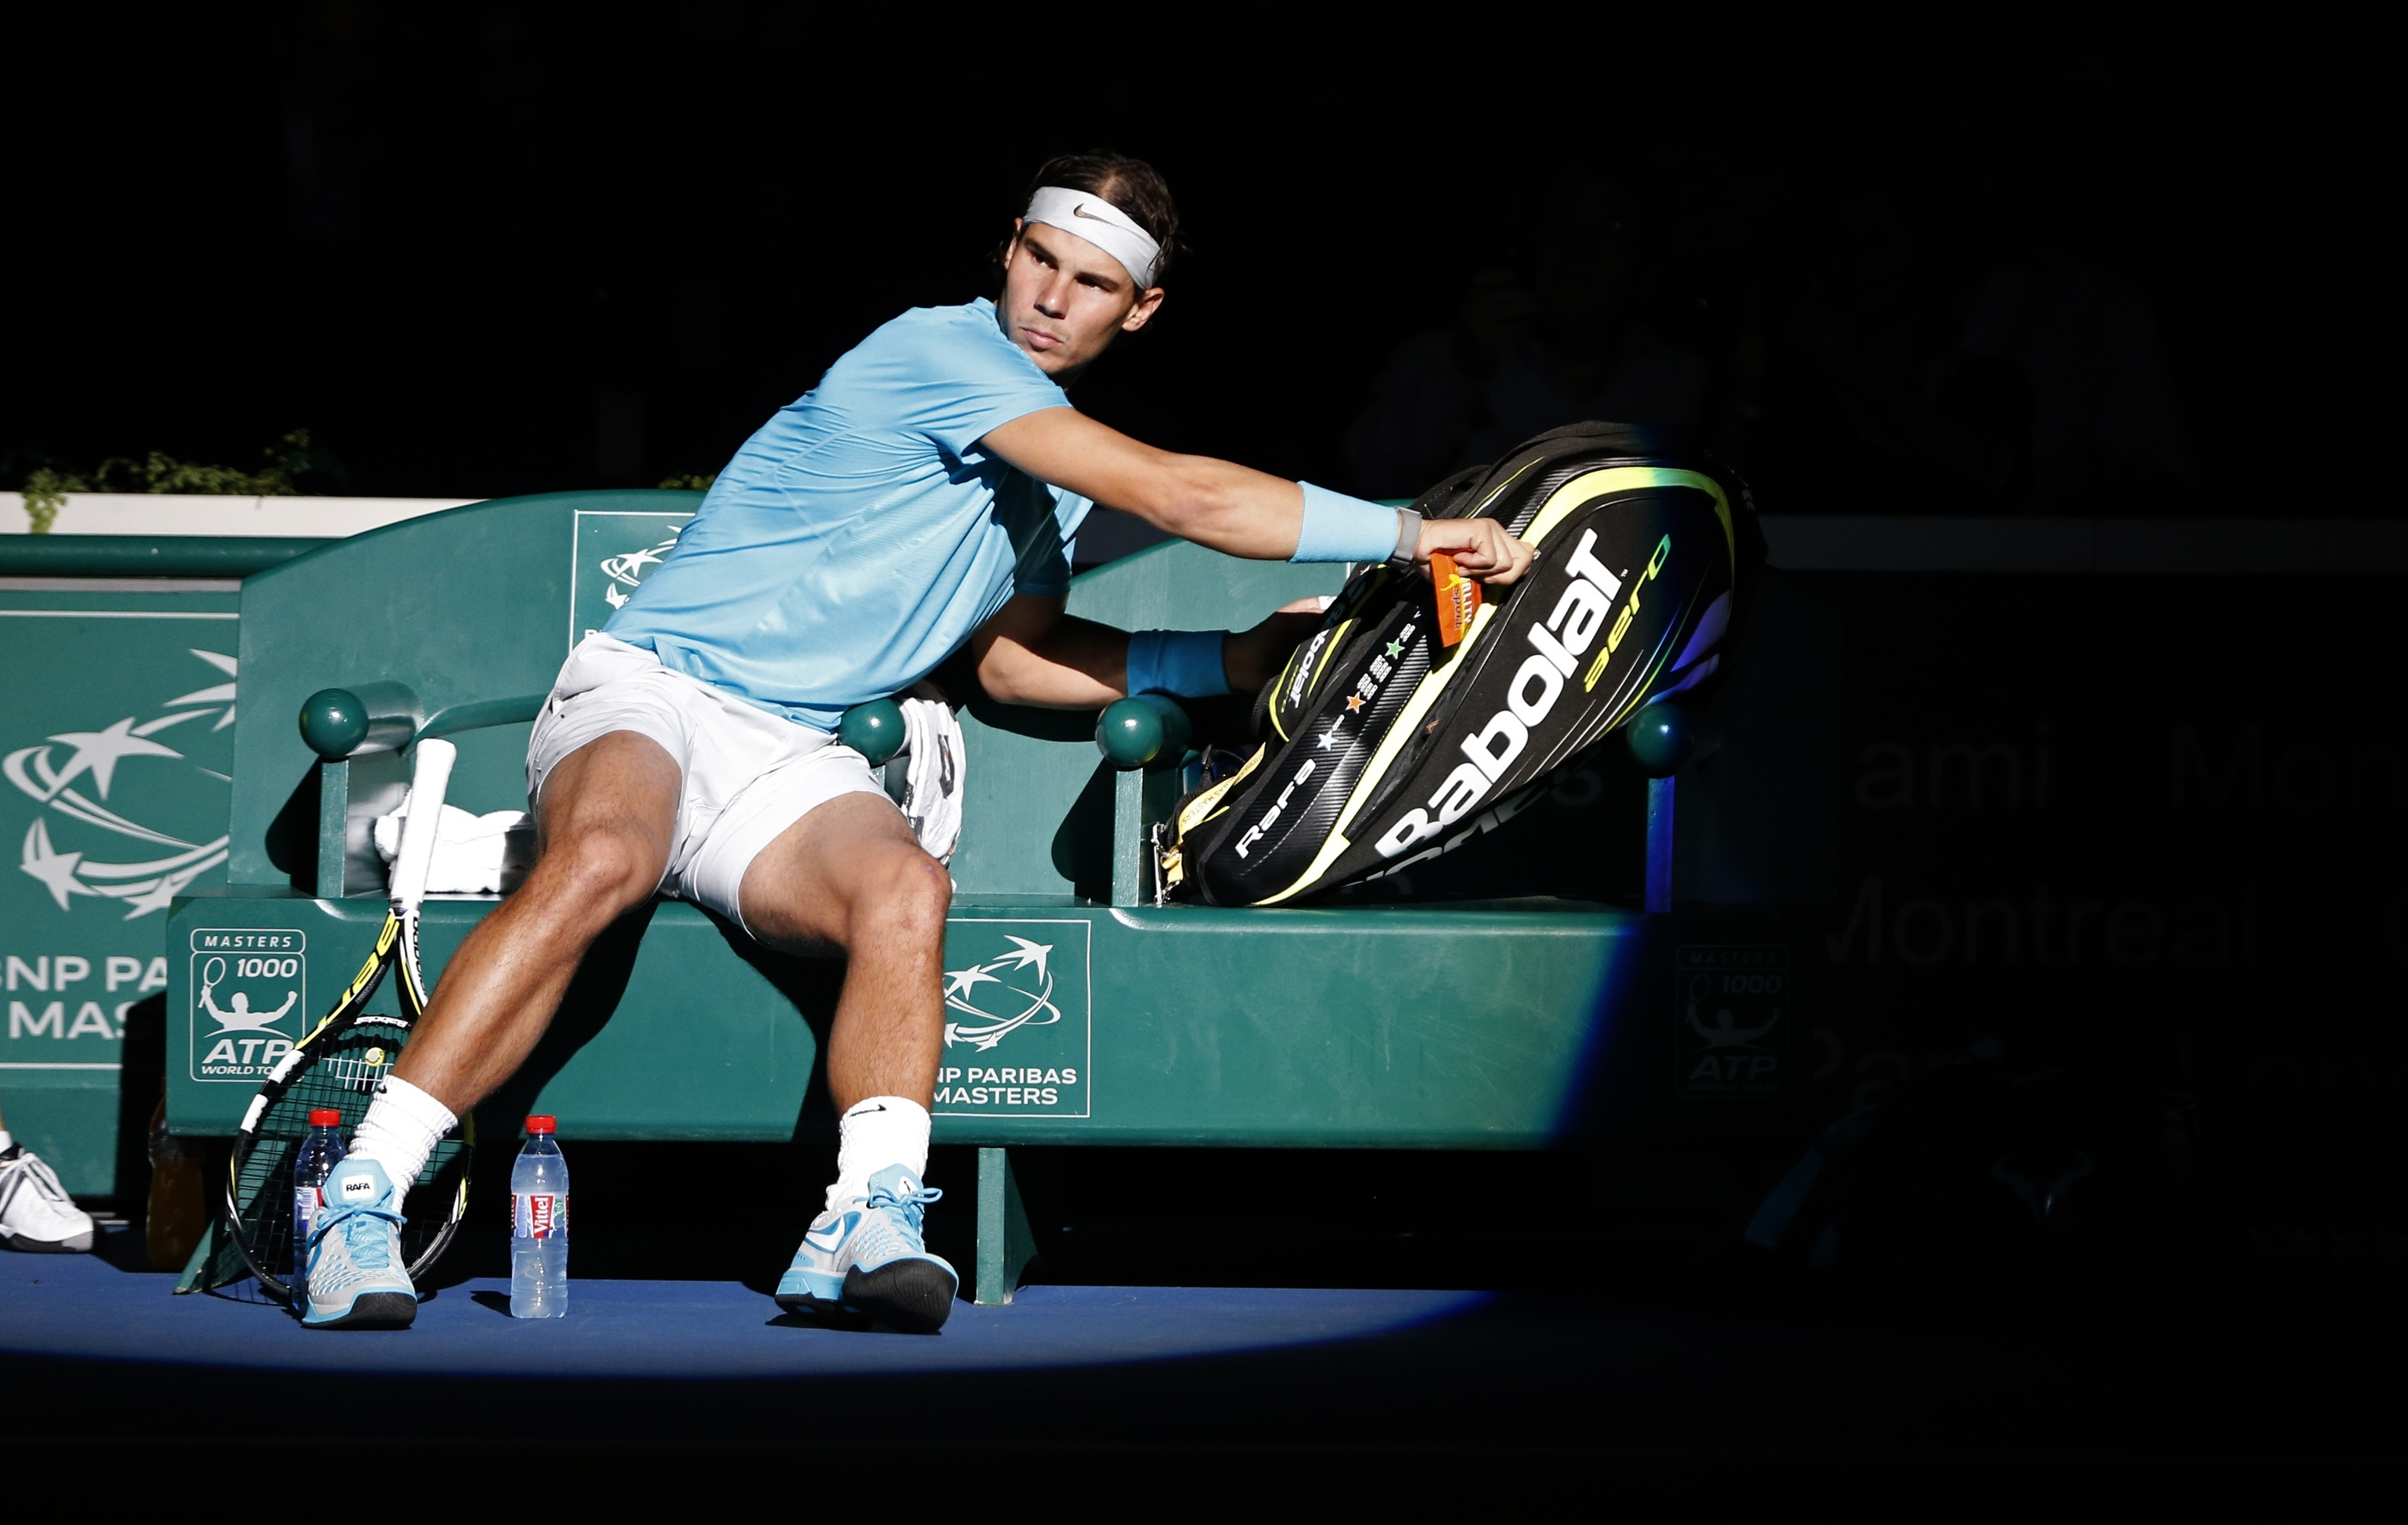 tennis atp nadal prefere zapper paris